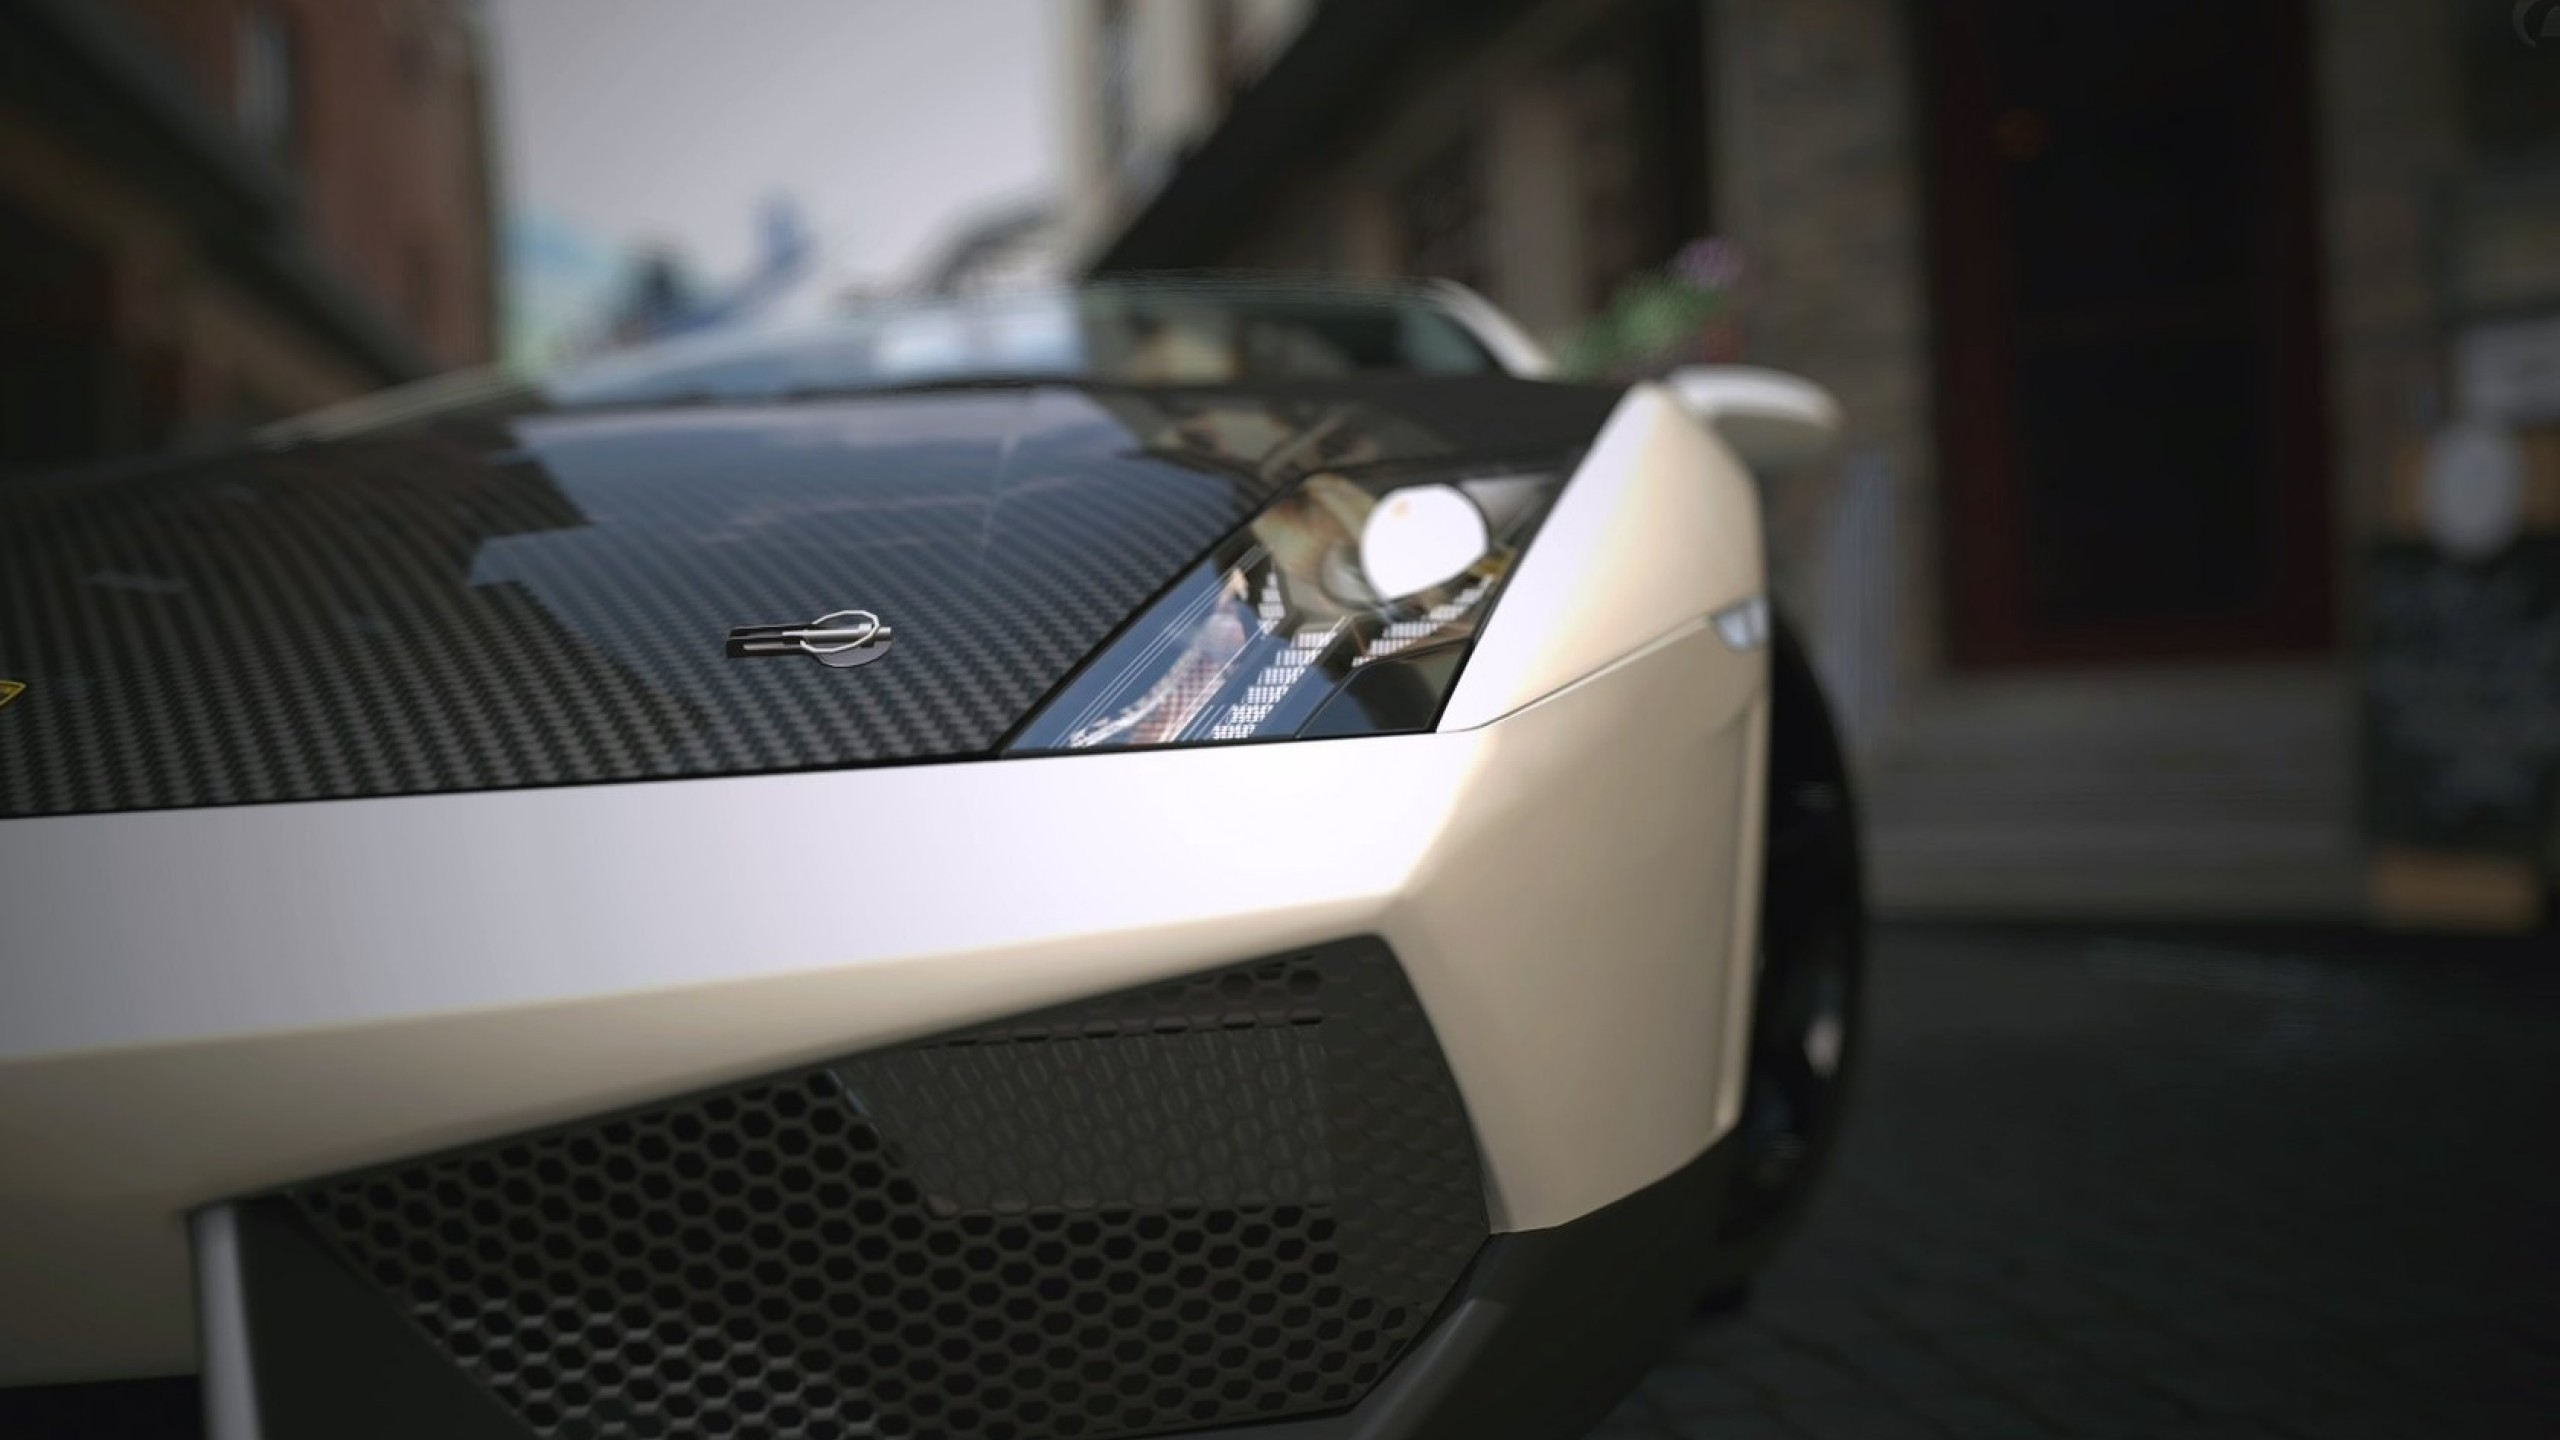 1600x1200 Lamborghini Front View Matte 1600x1200 Resolution Hd 4k